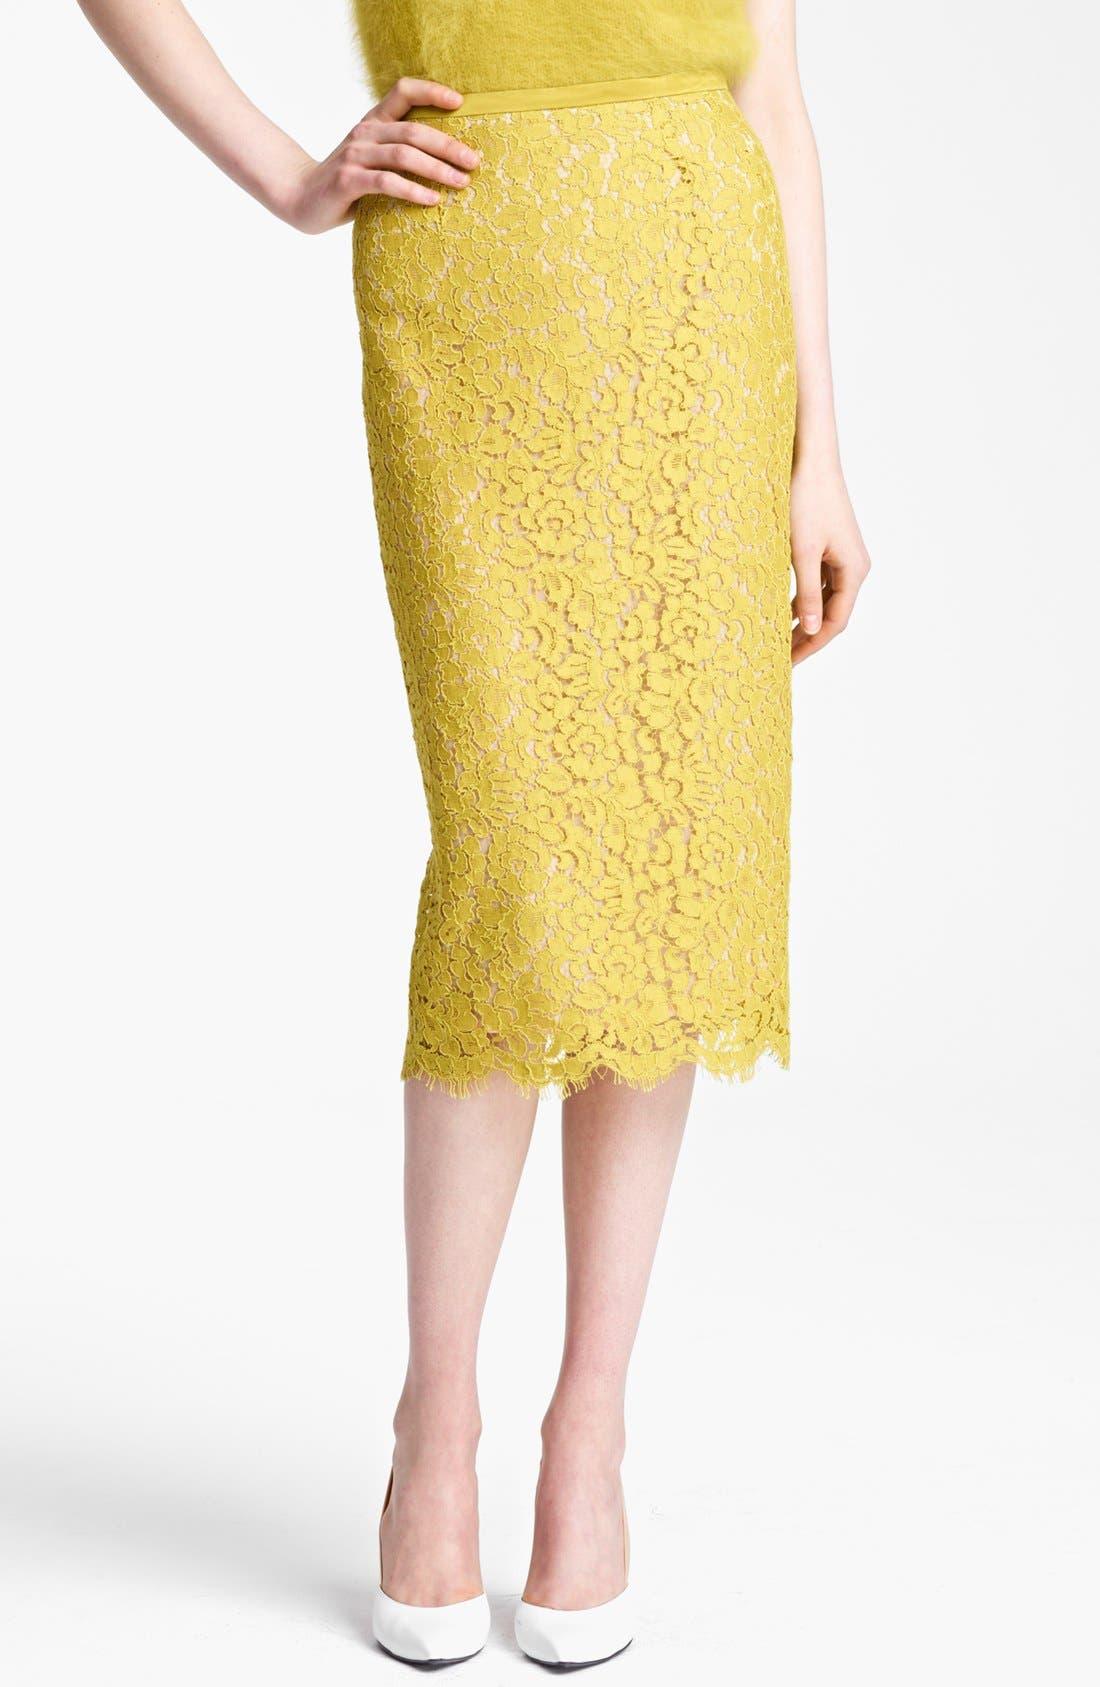 Alternate Image 1 Selected - Michael Kors Floral Lace Pencil Skirt